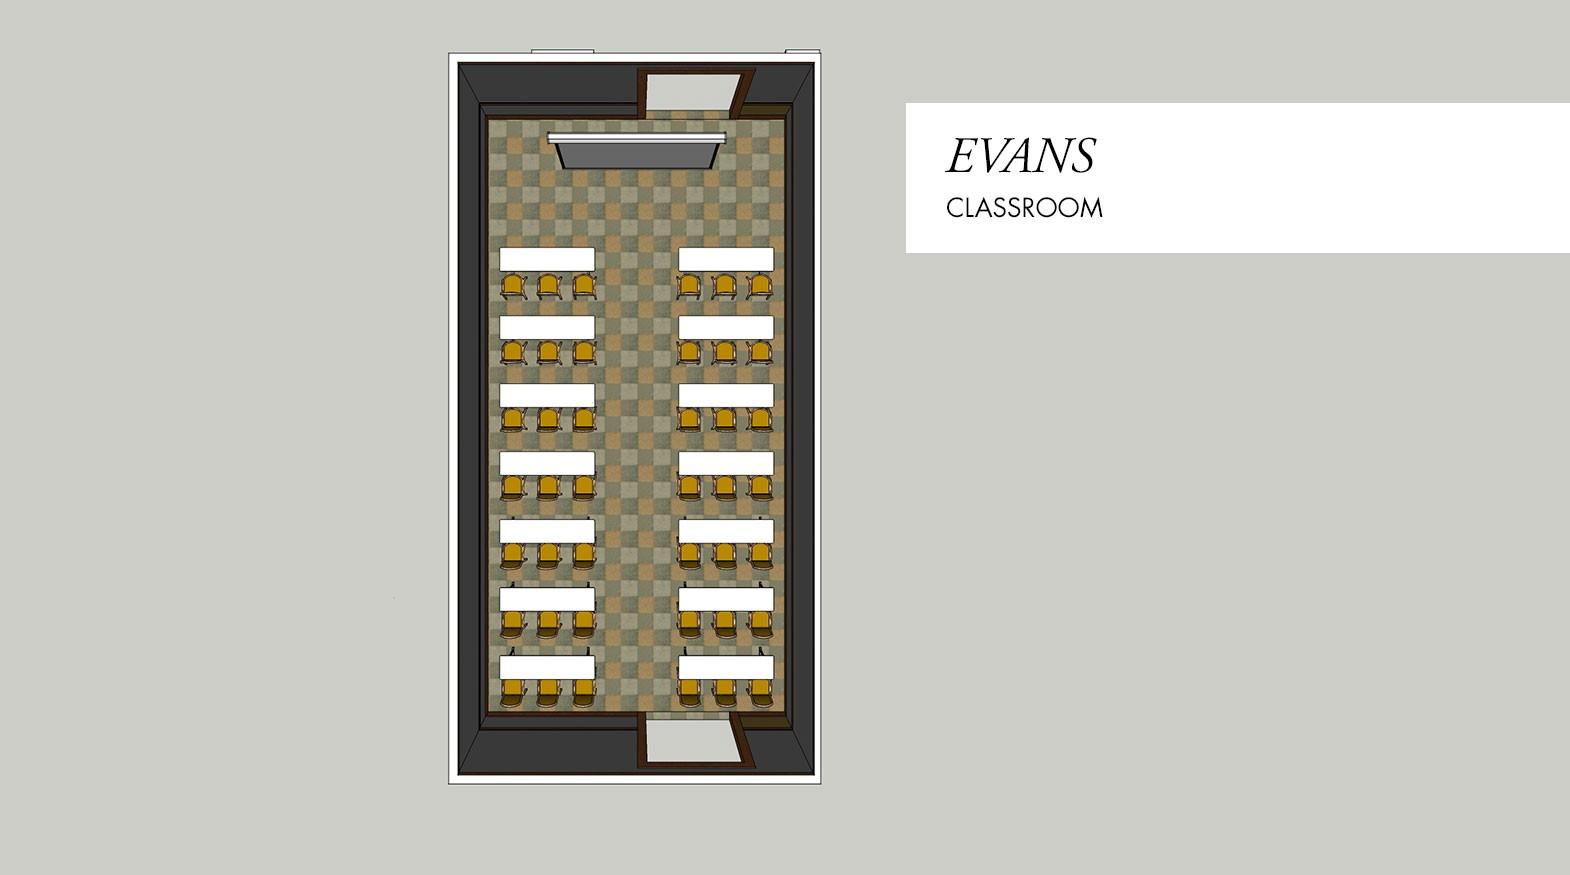 evans-classroom.jpg